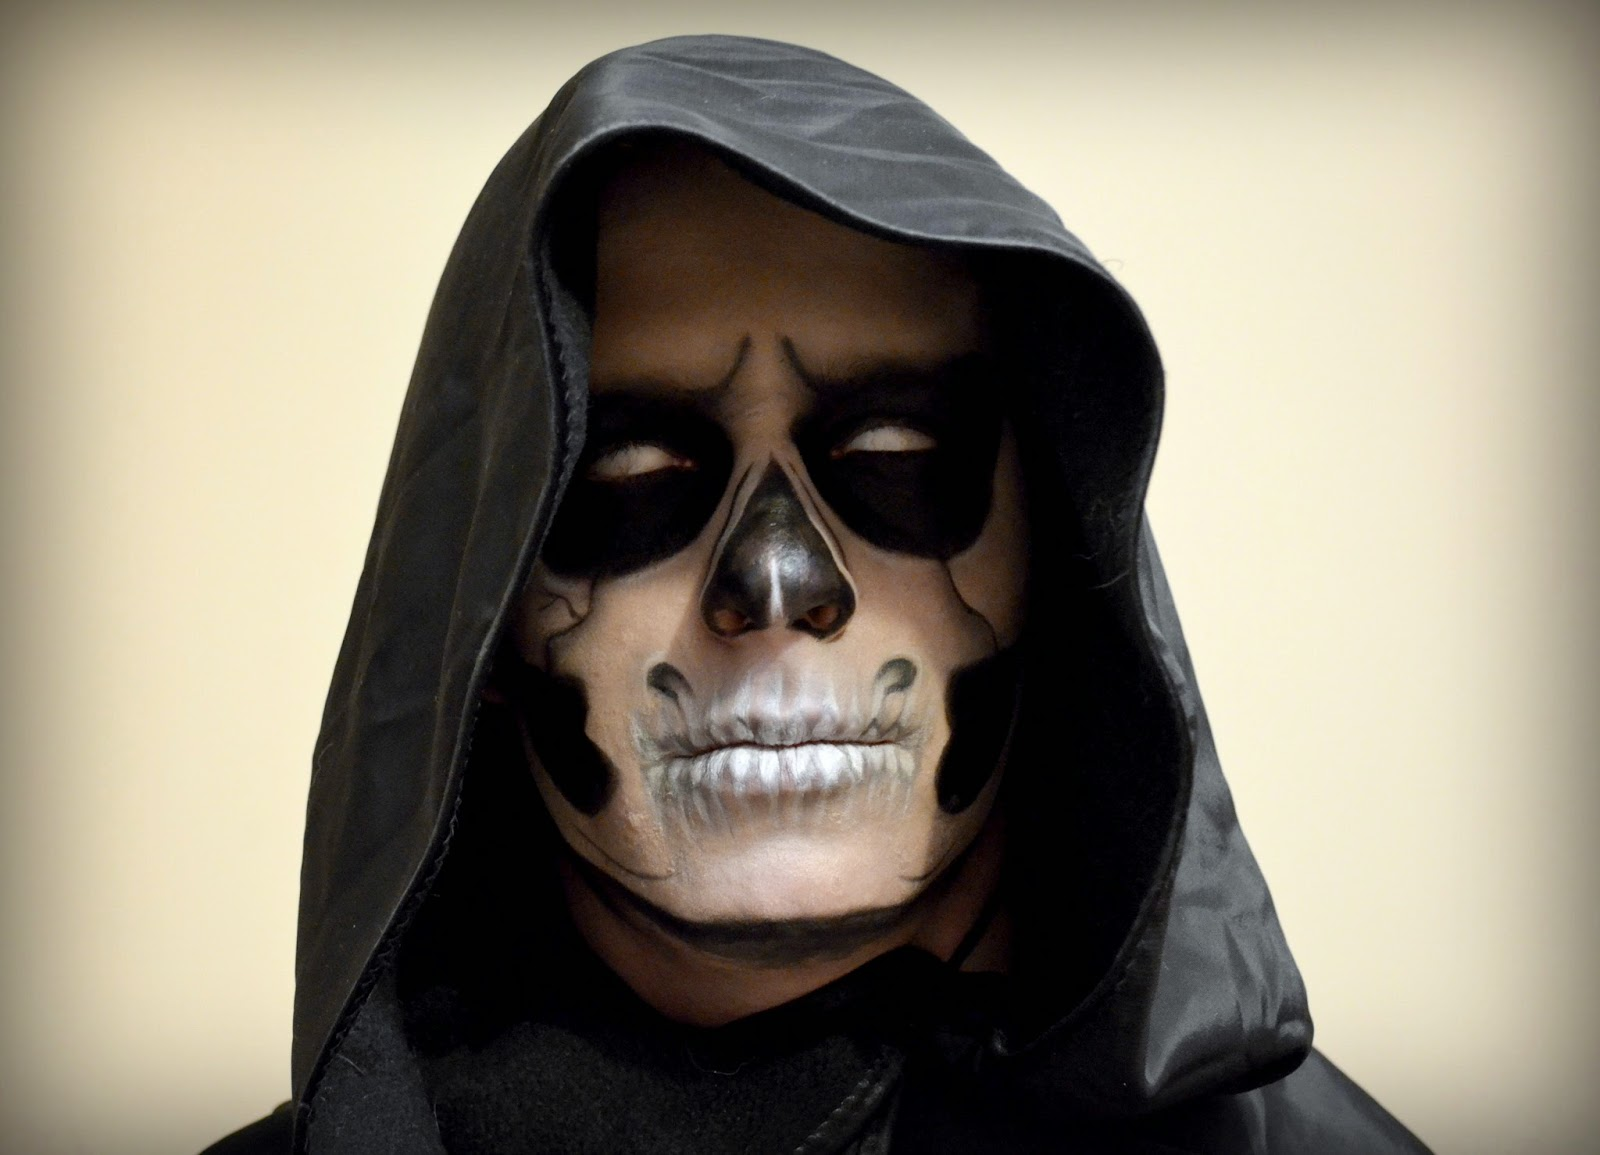 http://fifty-shades-of-beauty.blogspot.com/2015/01/charakteryzacja-skull-boy.html